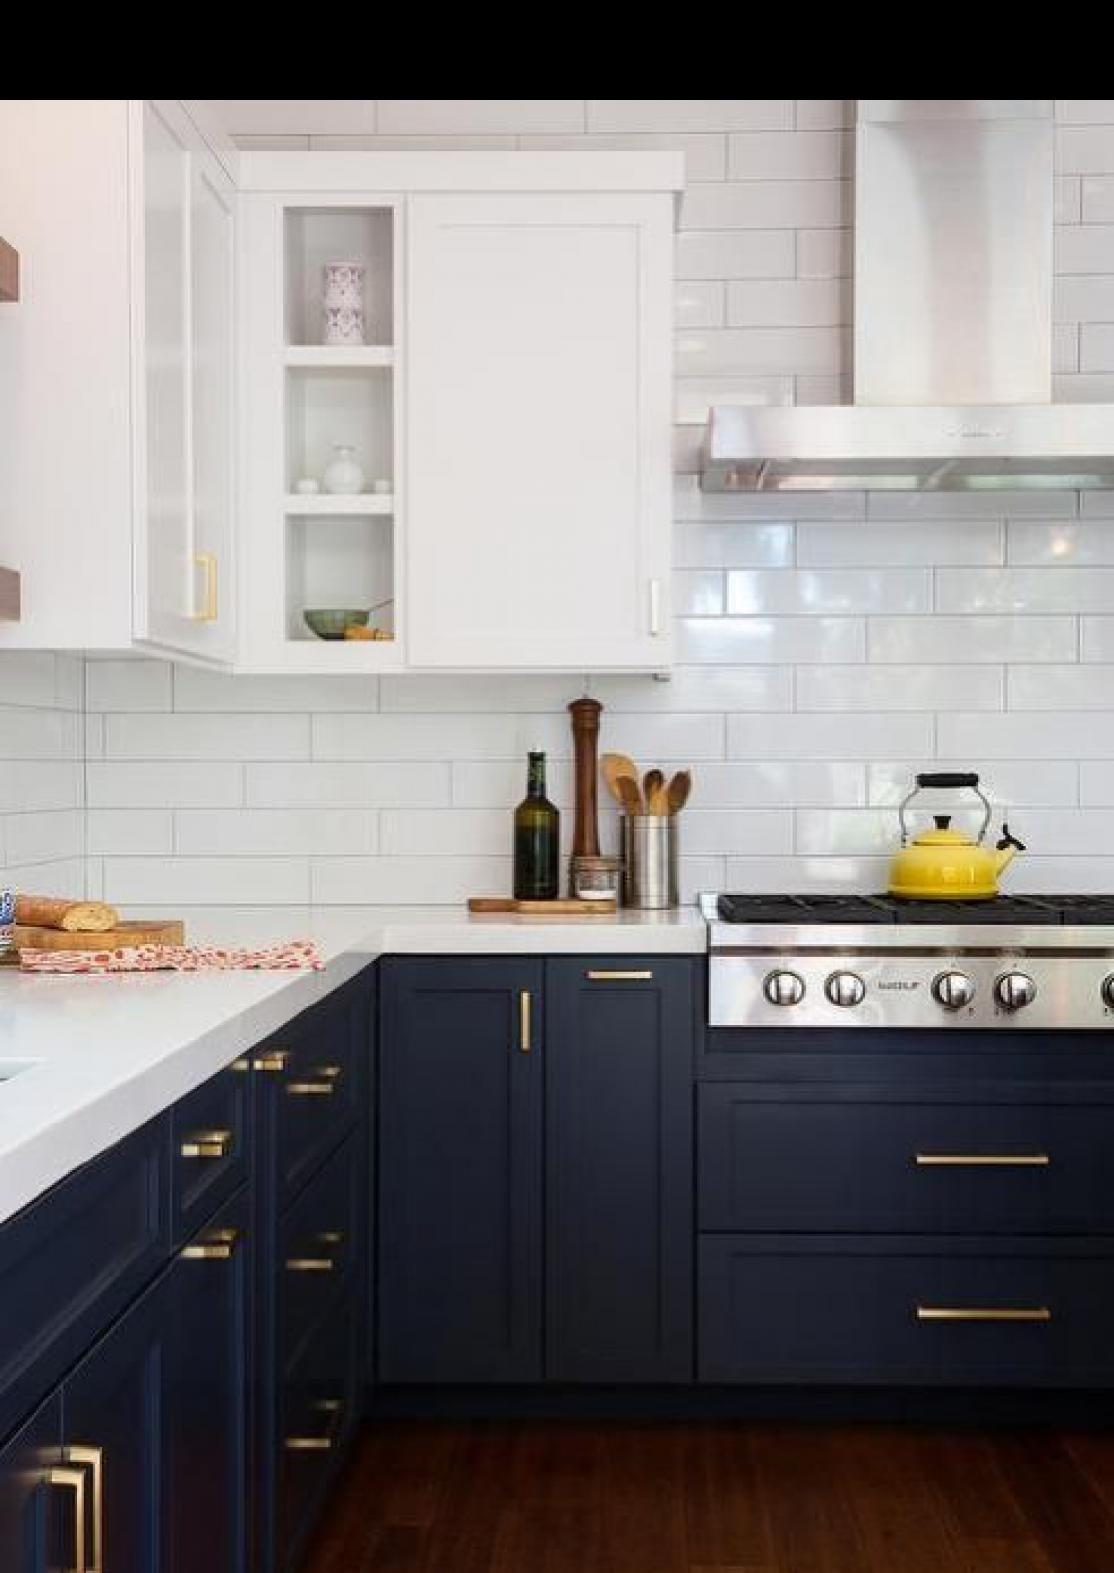 46 Chic Modern Farmhouse Kitchen Decor Ideas In 2020 Kitchen Cabinets Decor Used Kitchen Cabinets Kitchen Cabinet Trends